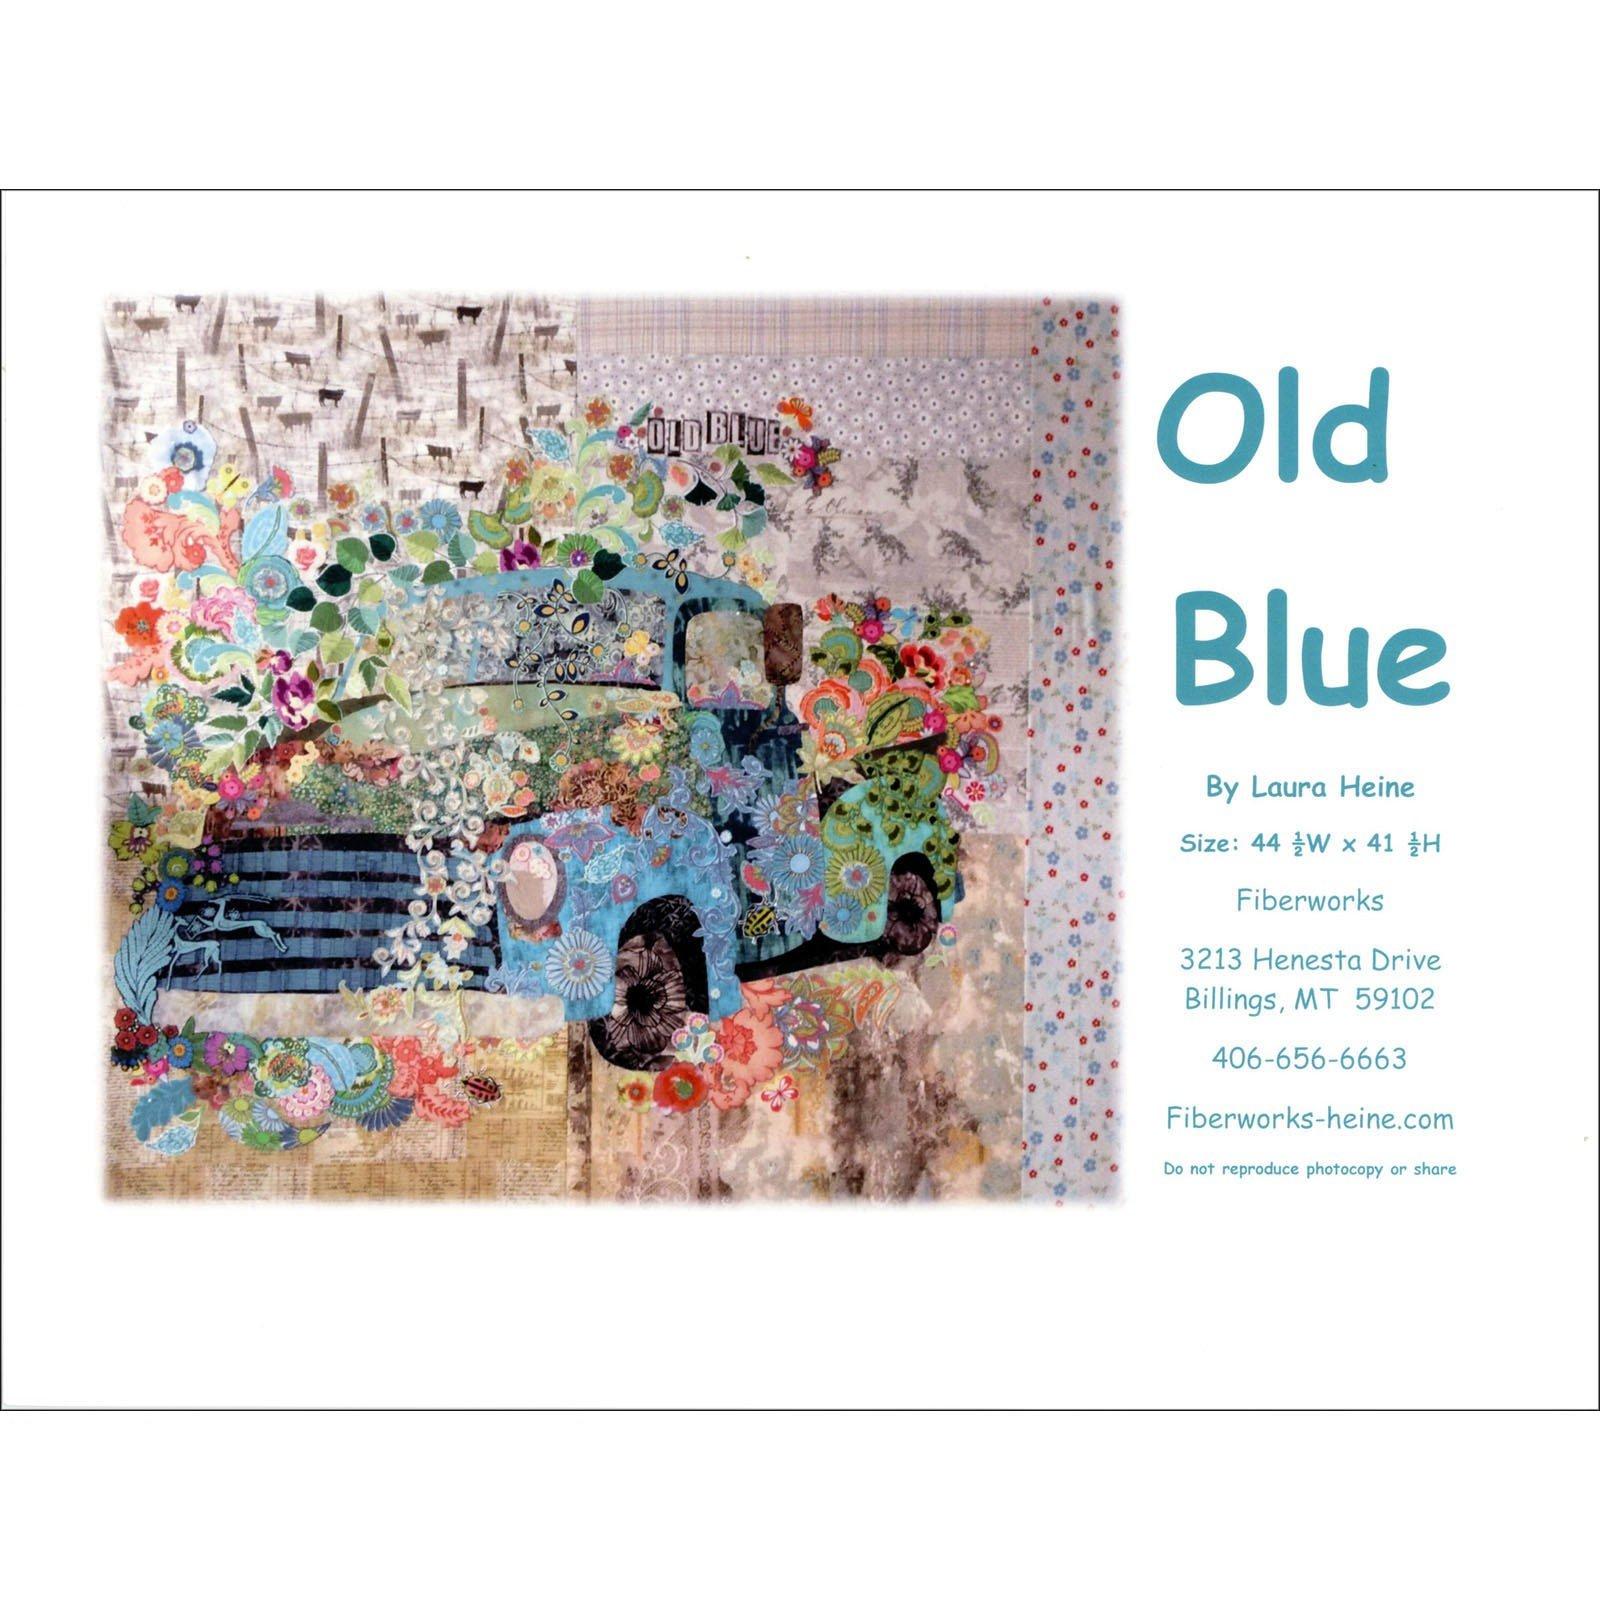 Old Blue - Collage Pattern by Laura Heine